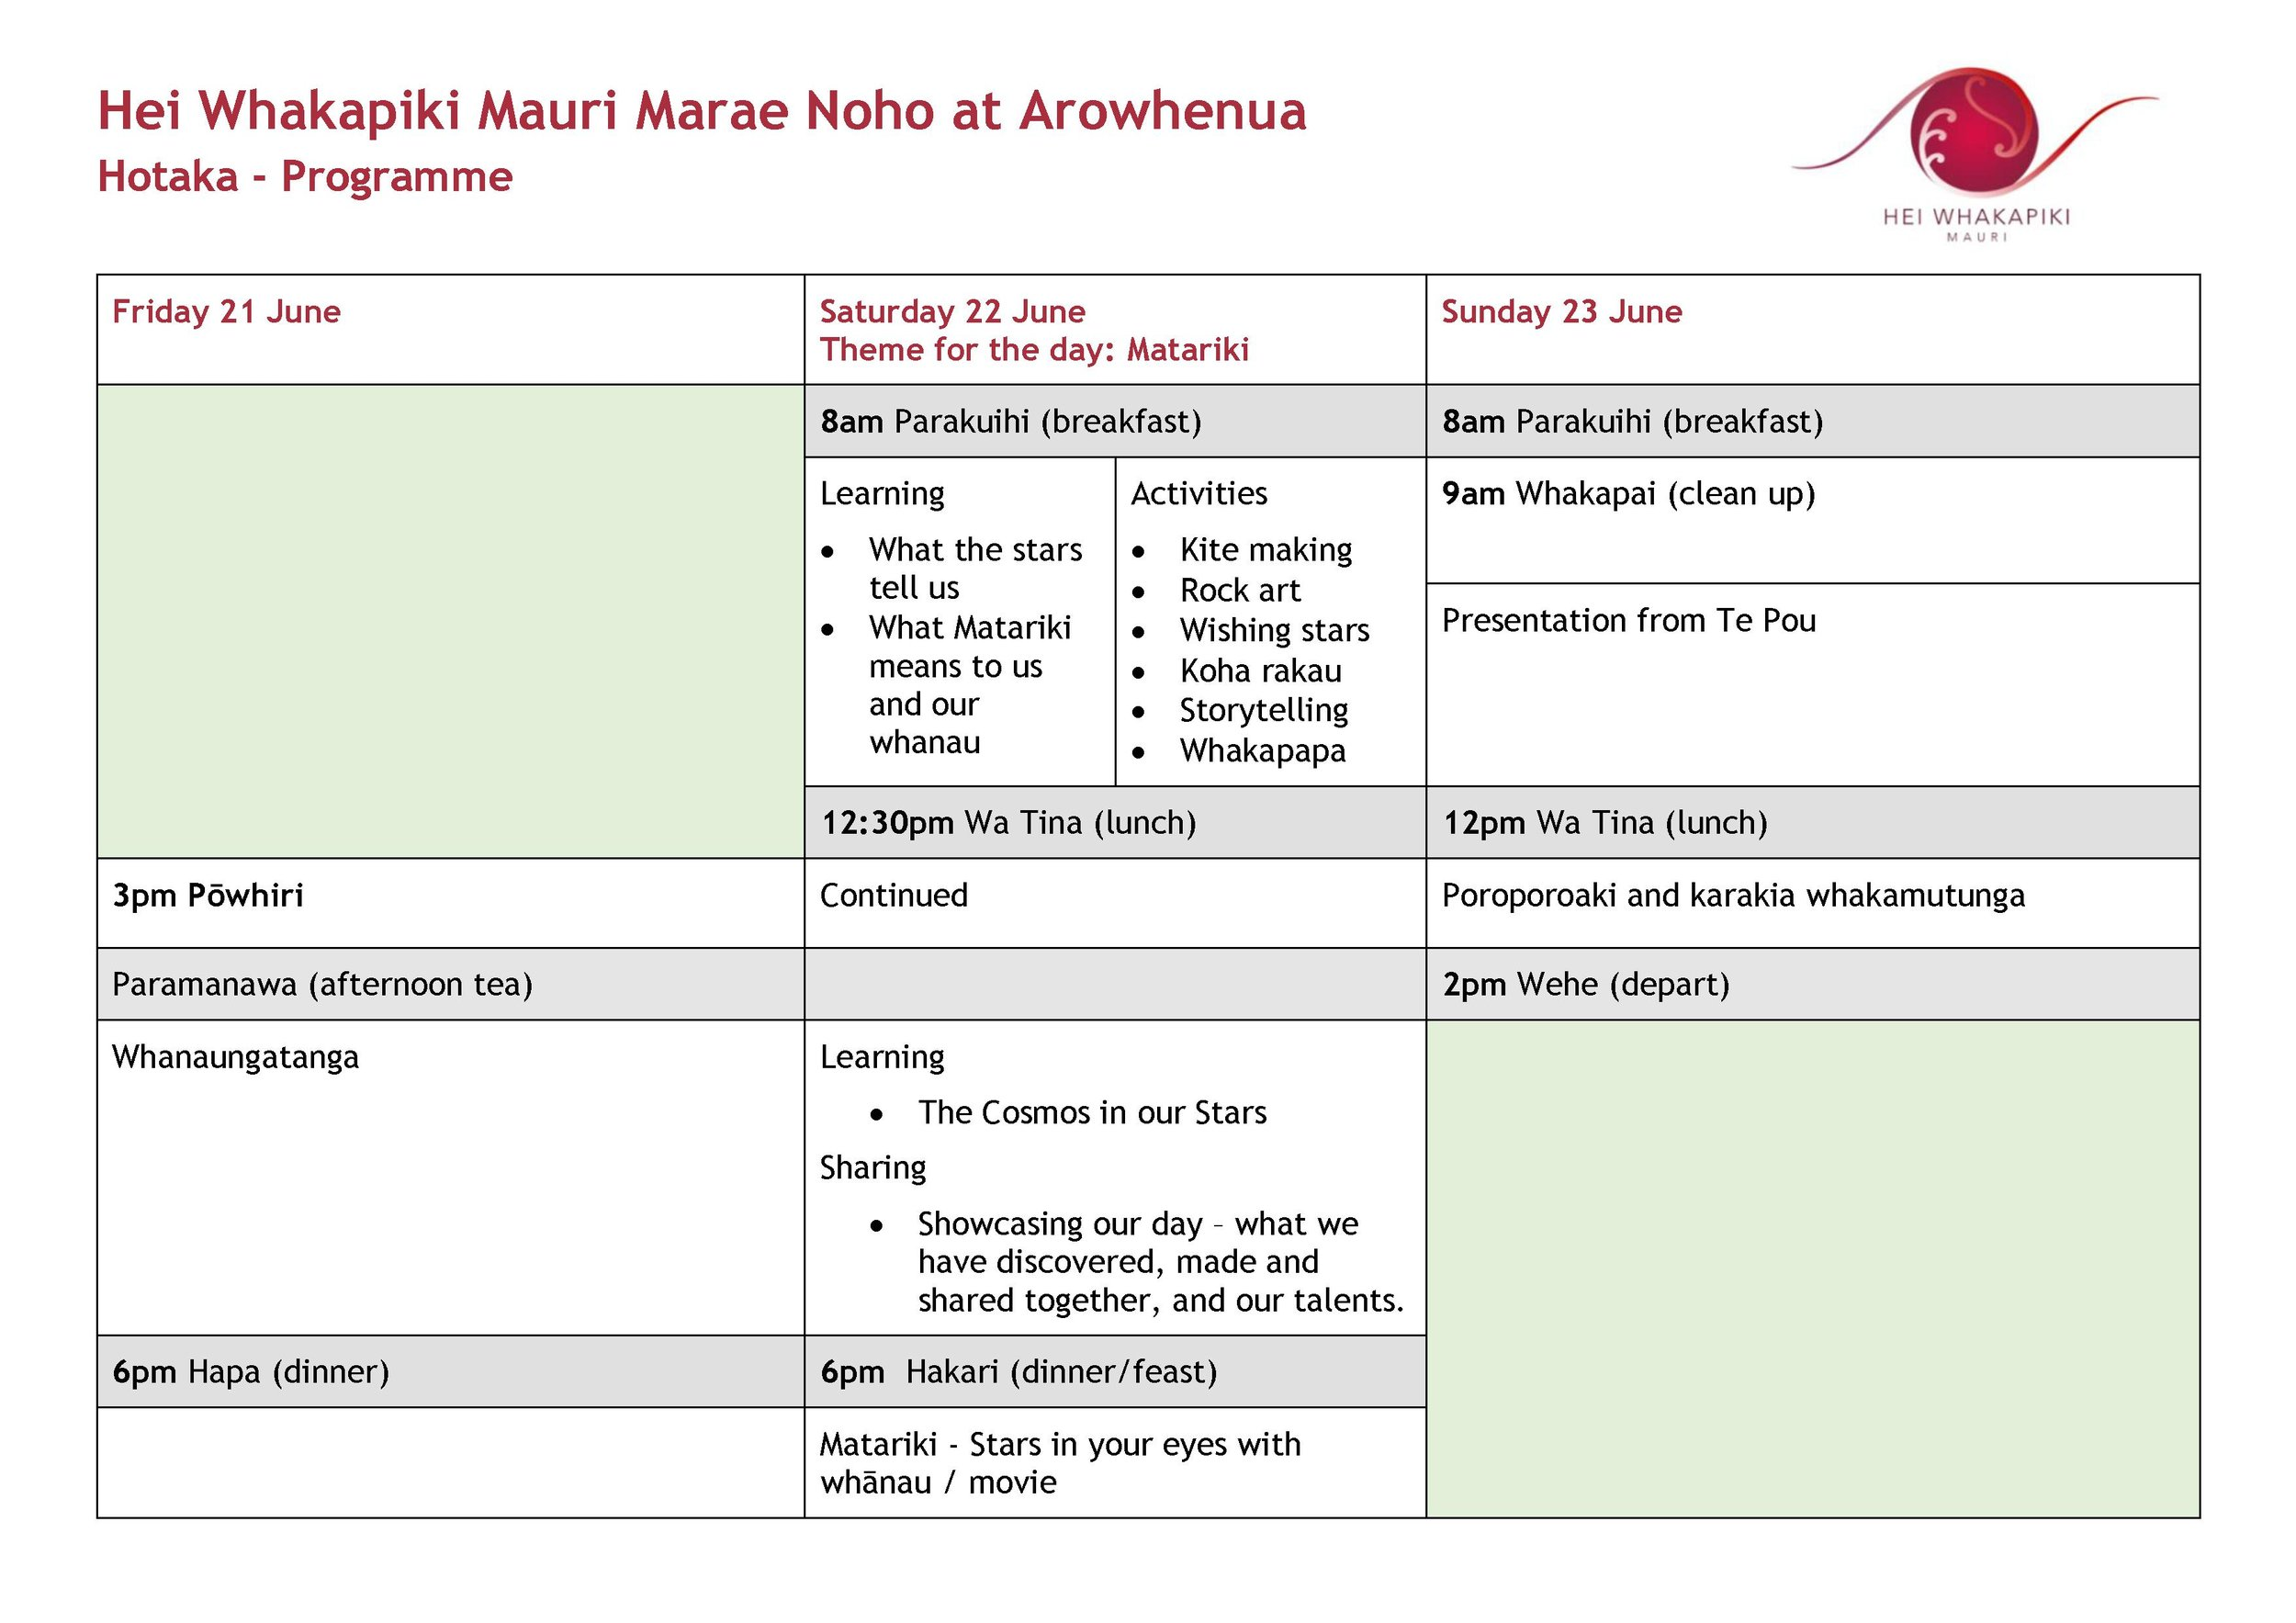 Marae Noho Programme 21-23 June 2019.jpg